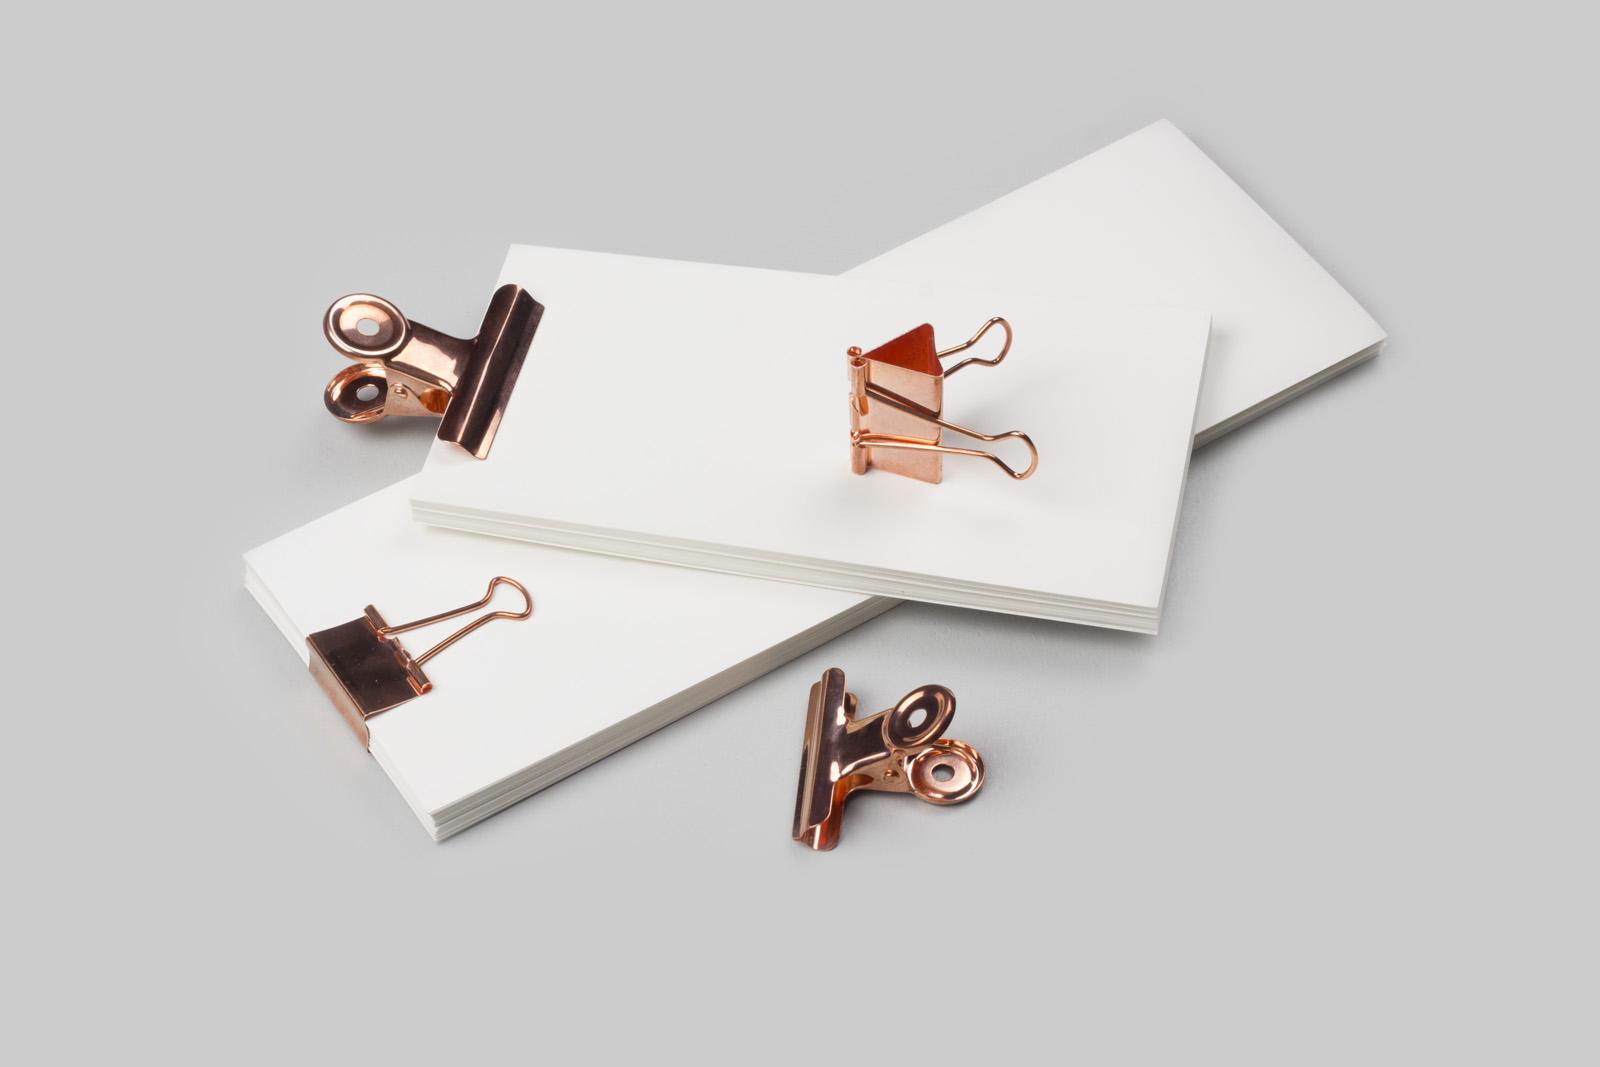 copper-clips-set-1a